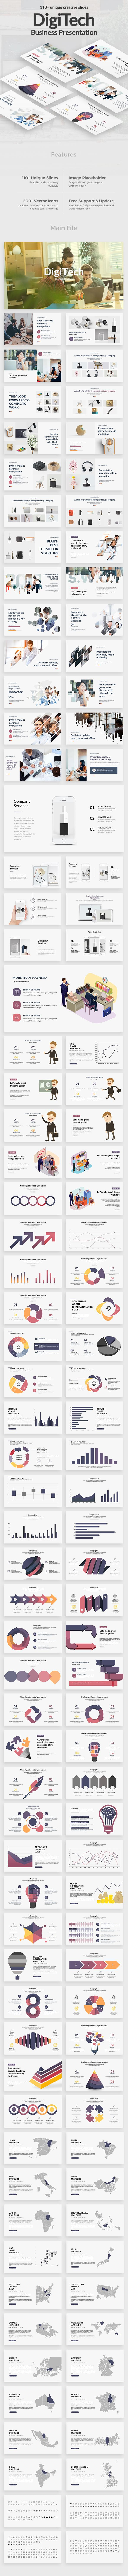 DigiTech Multipurpose Powerpoint Template - Business PowerPoint Templates